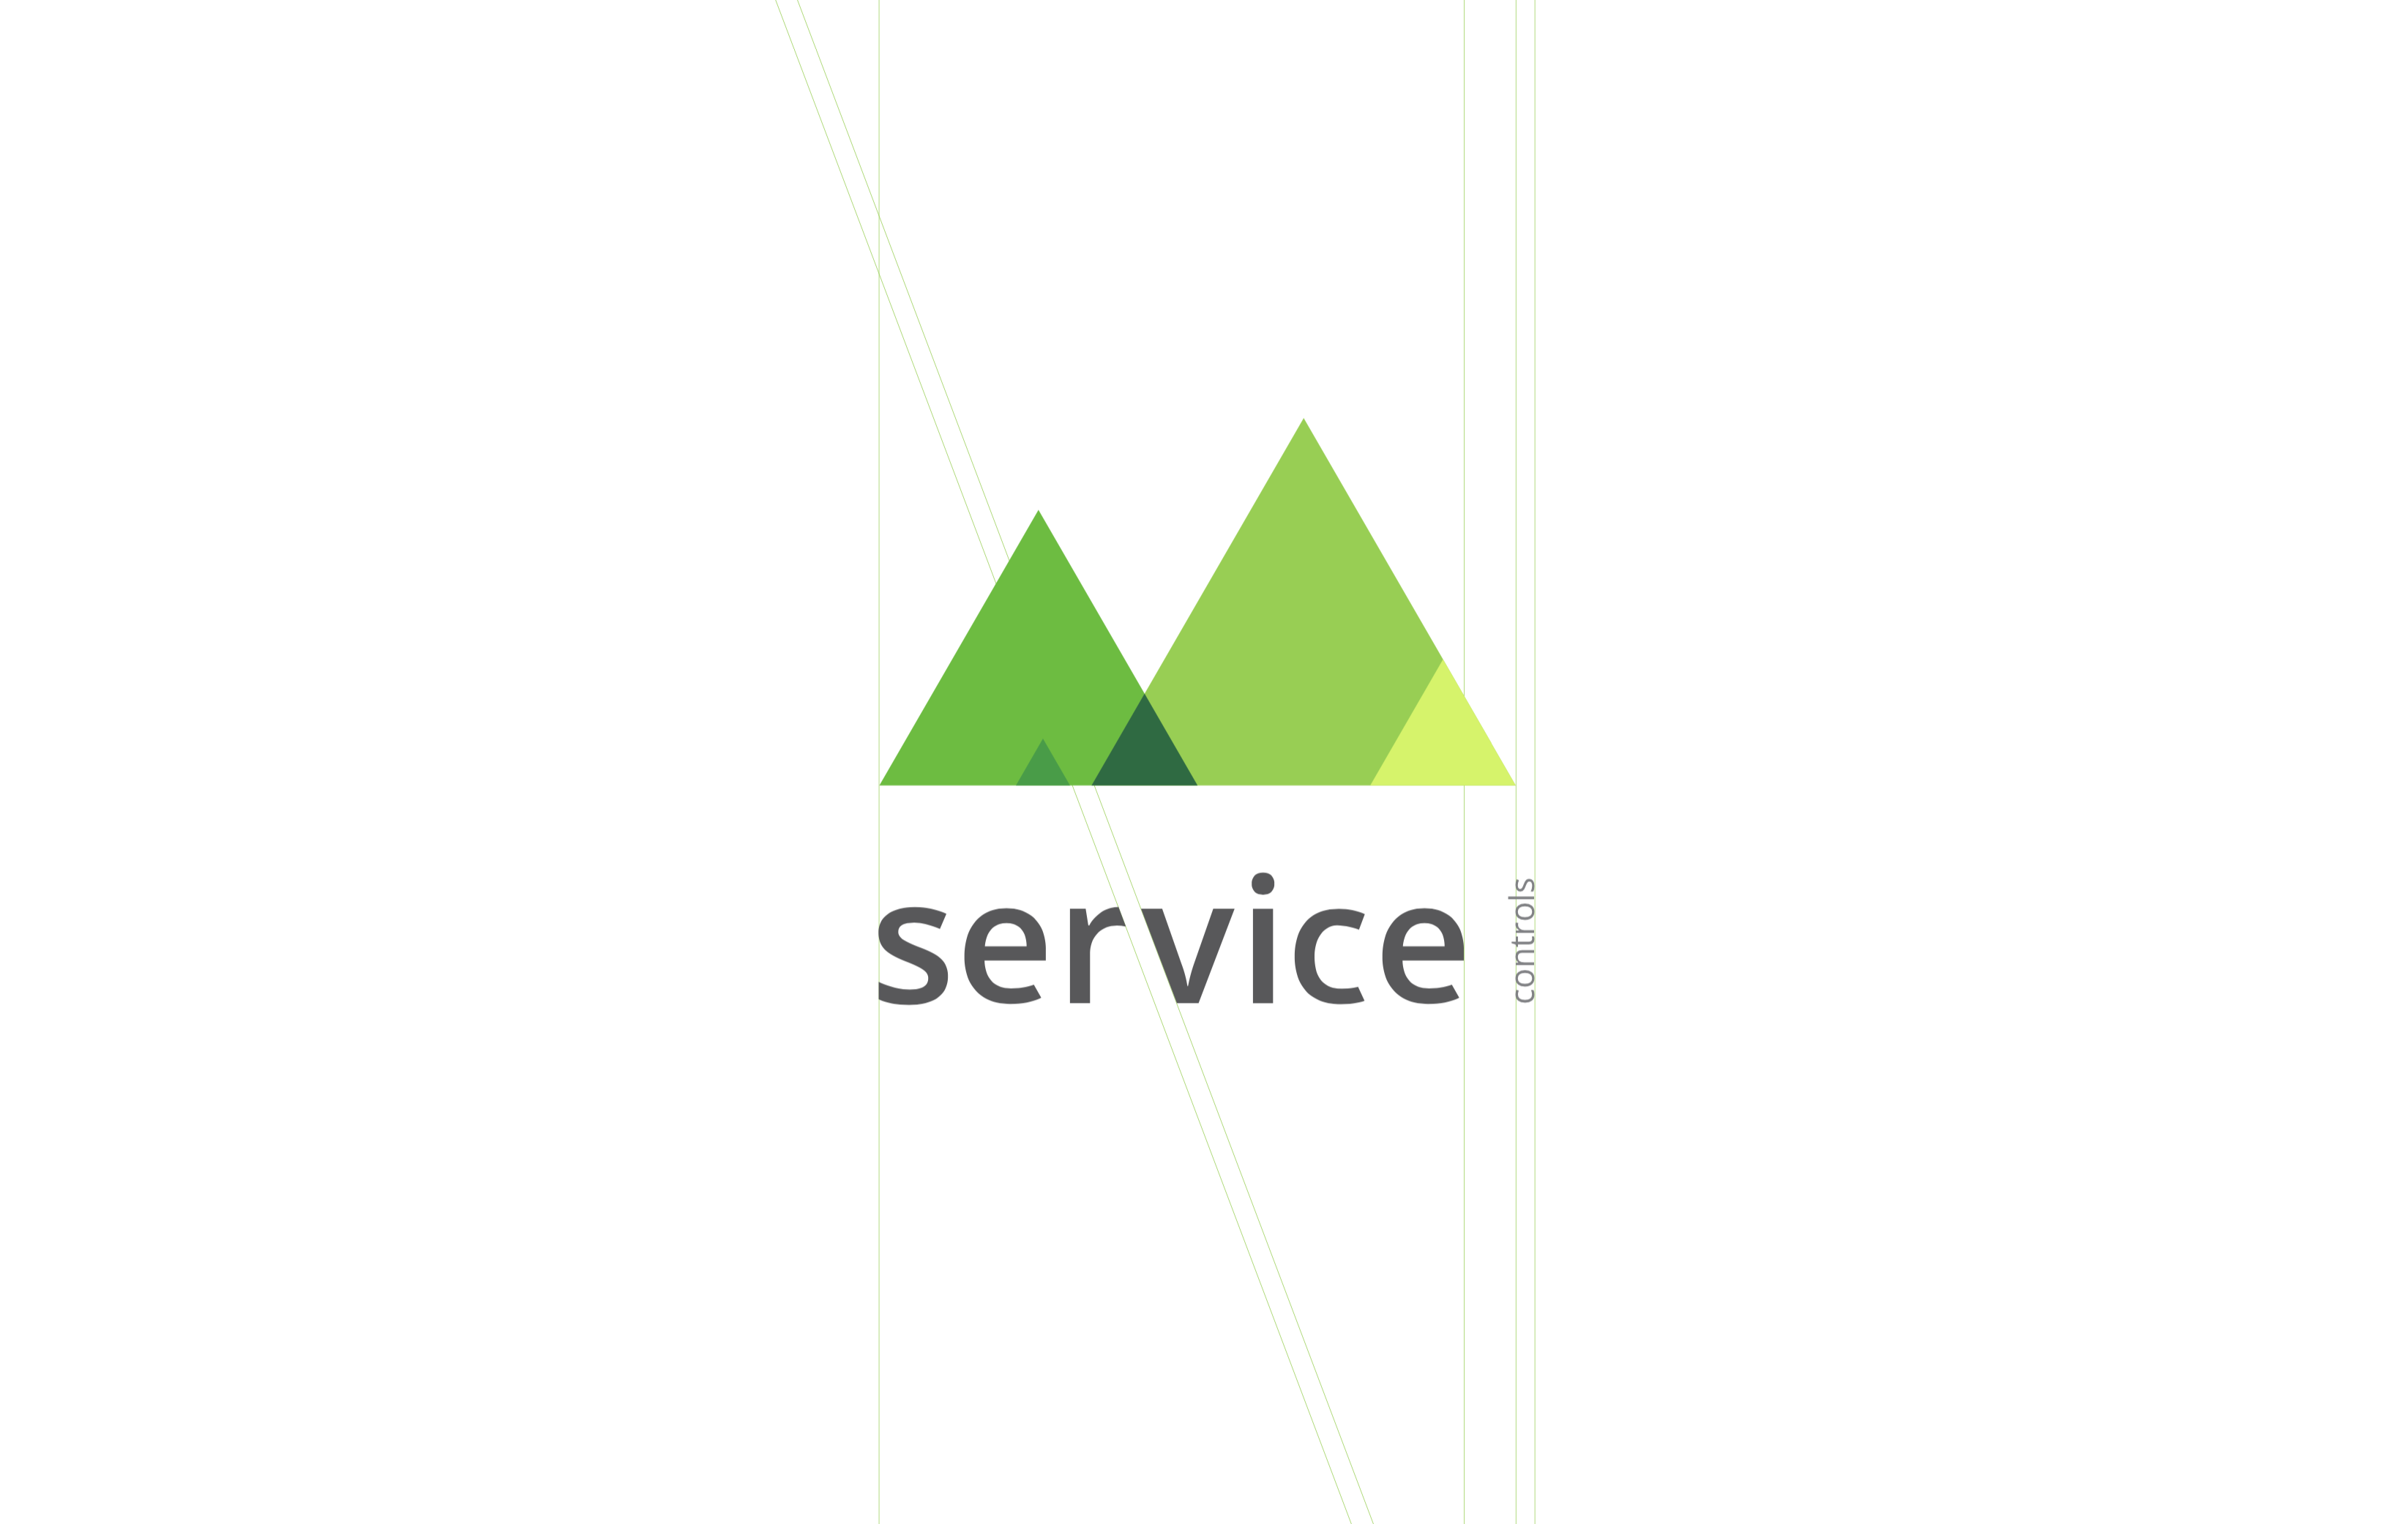 service controls case pagina 7